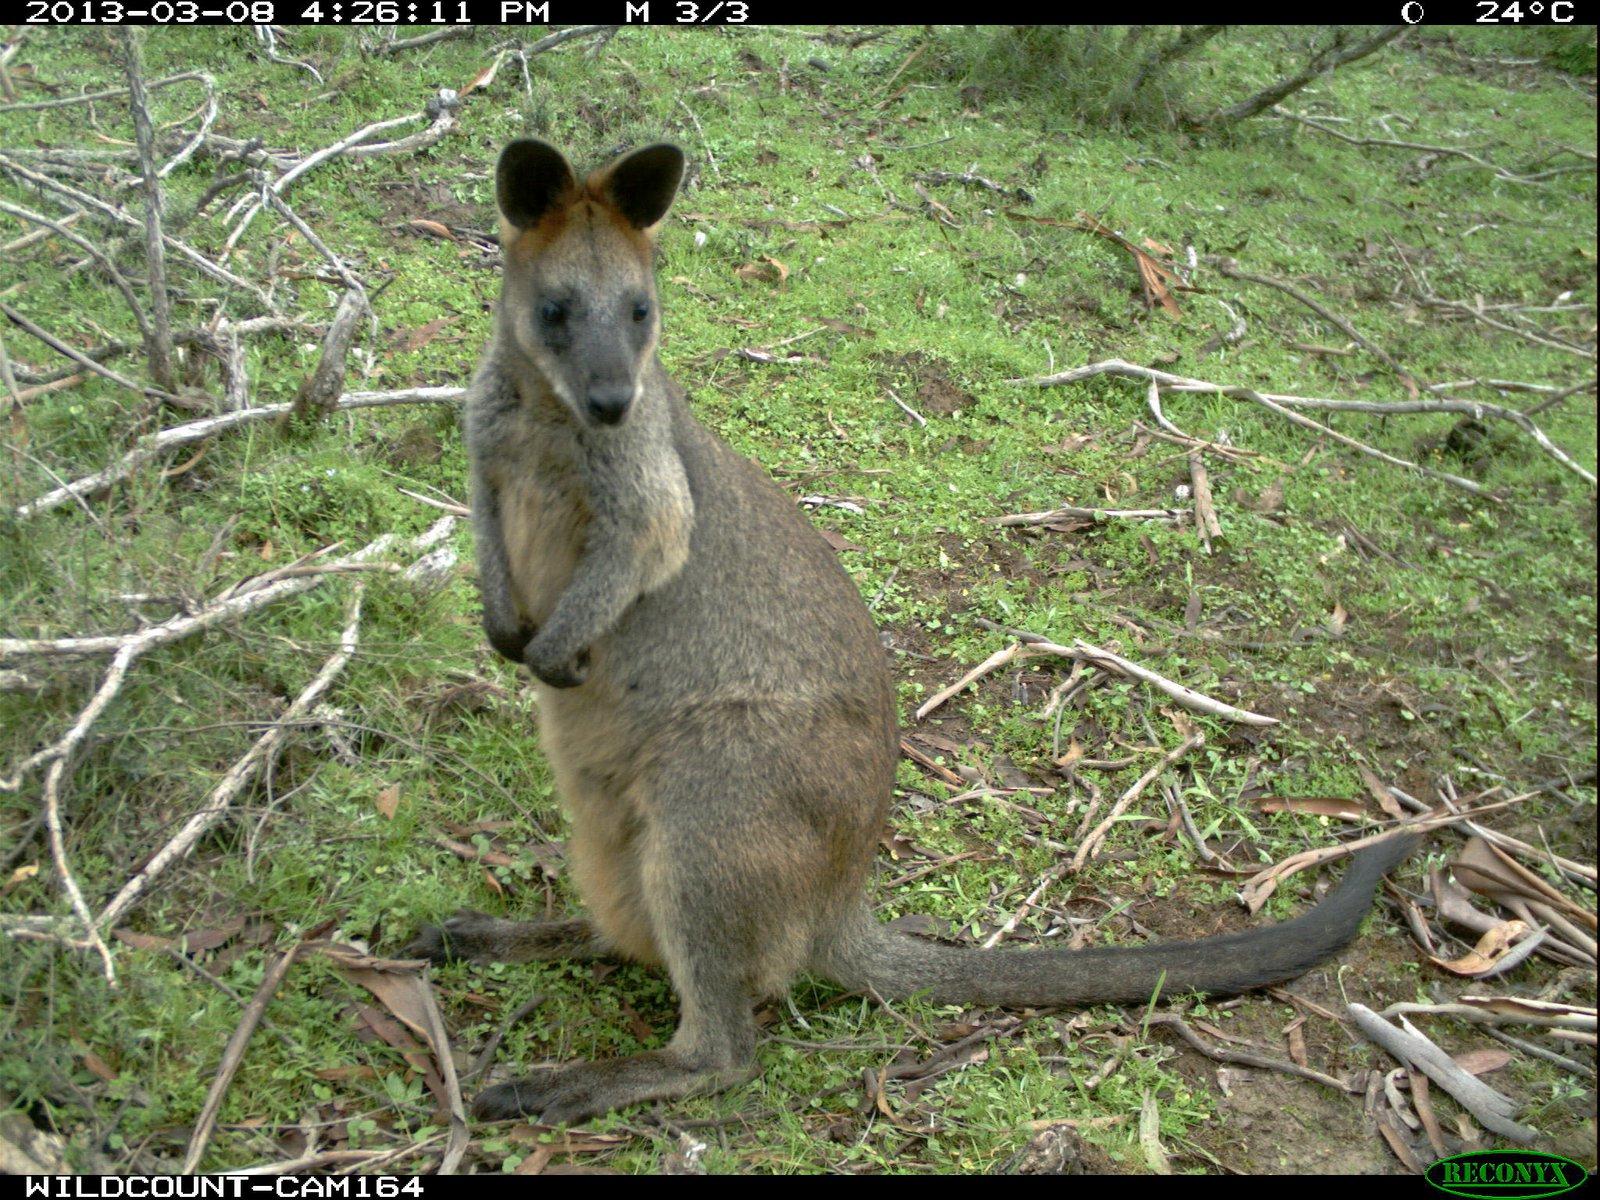 Wildlife Spotter camera trap capture